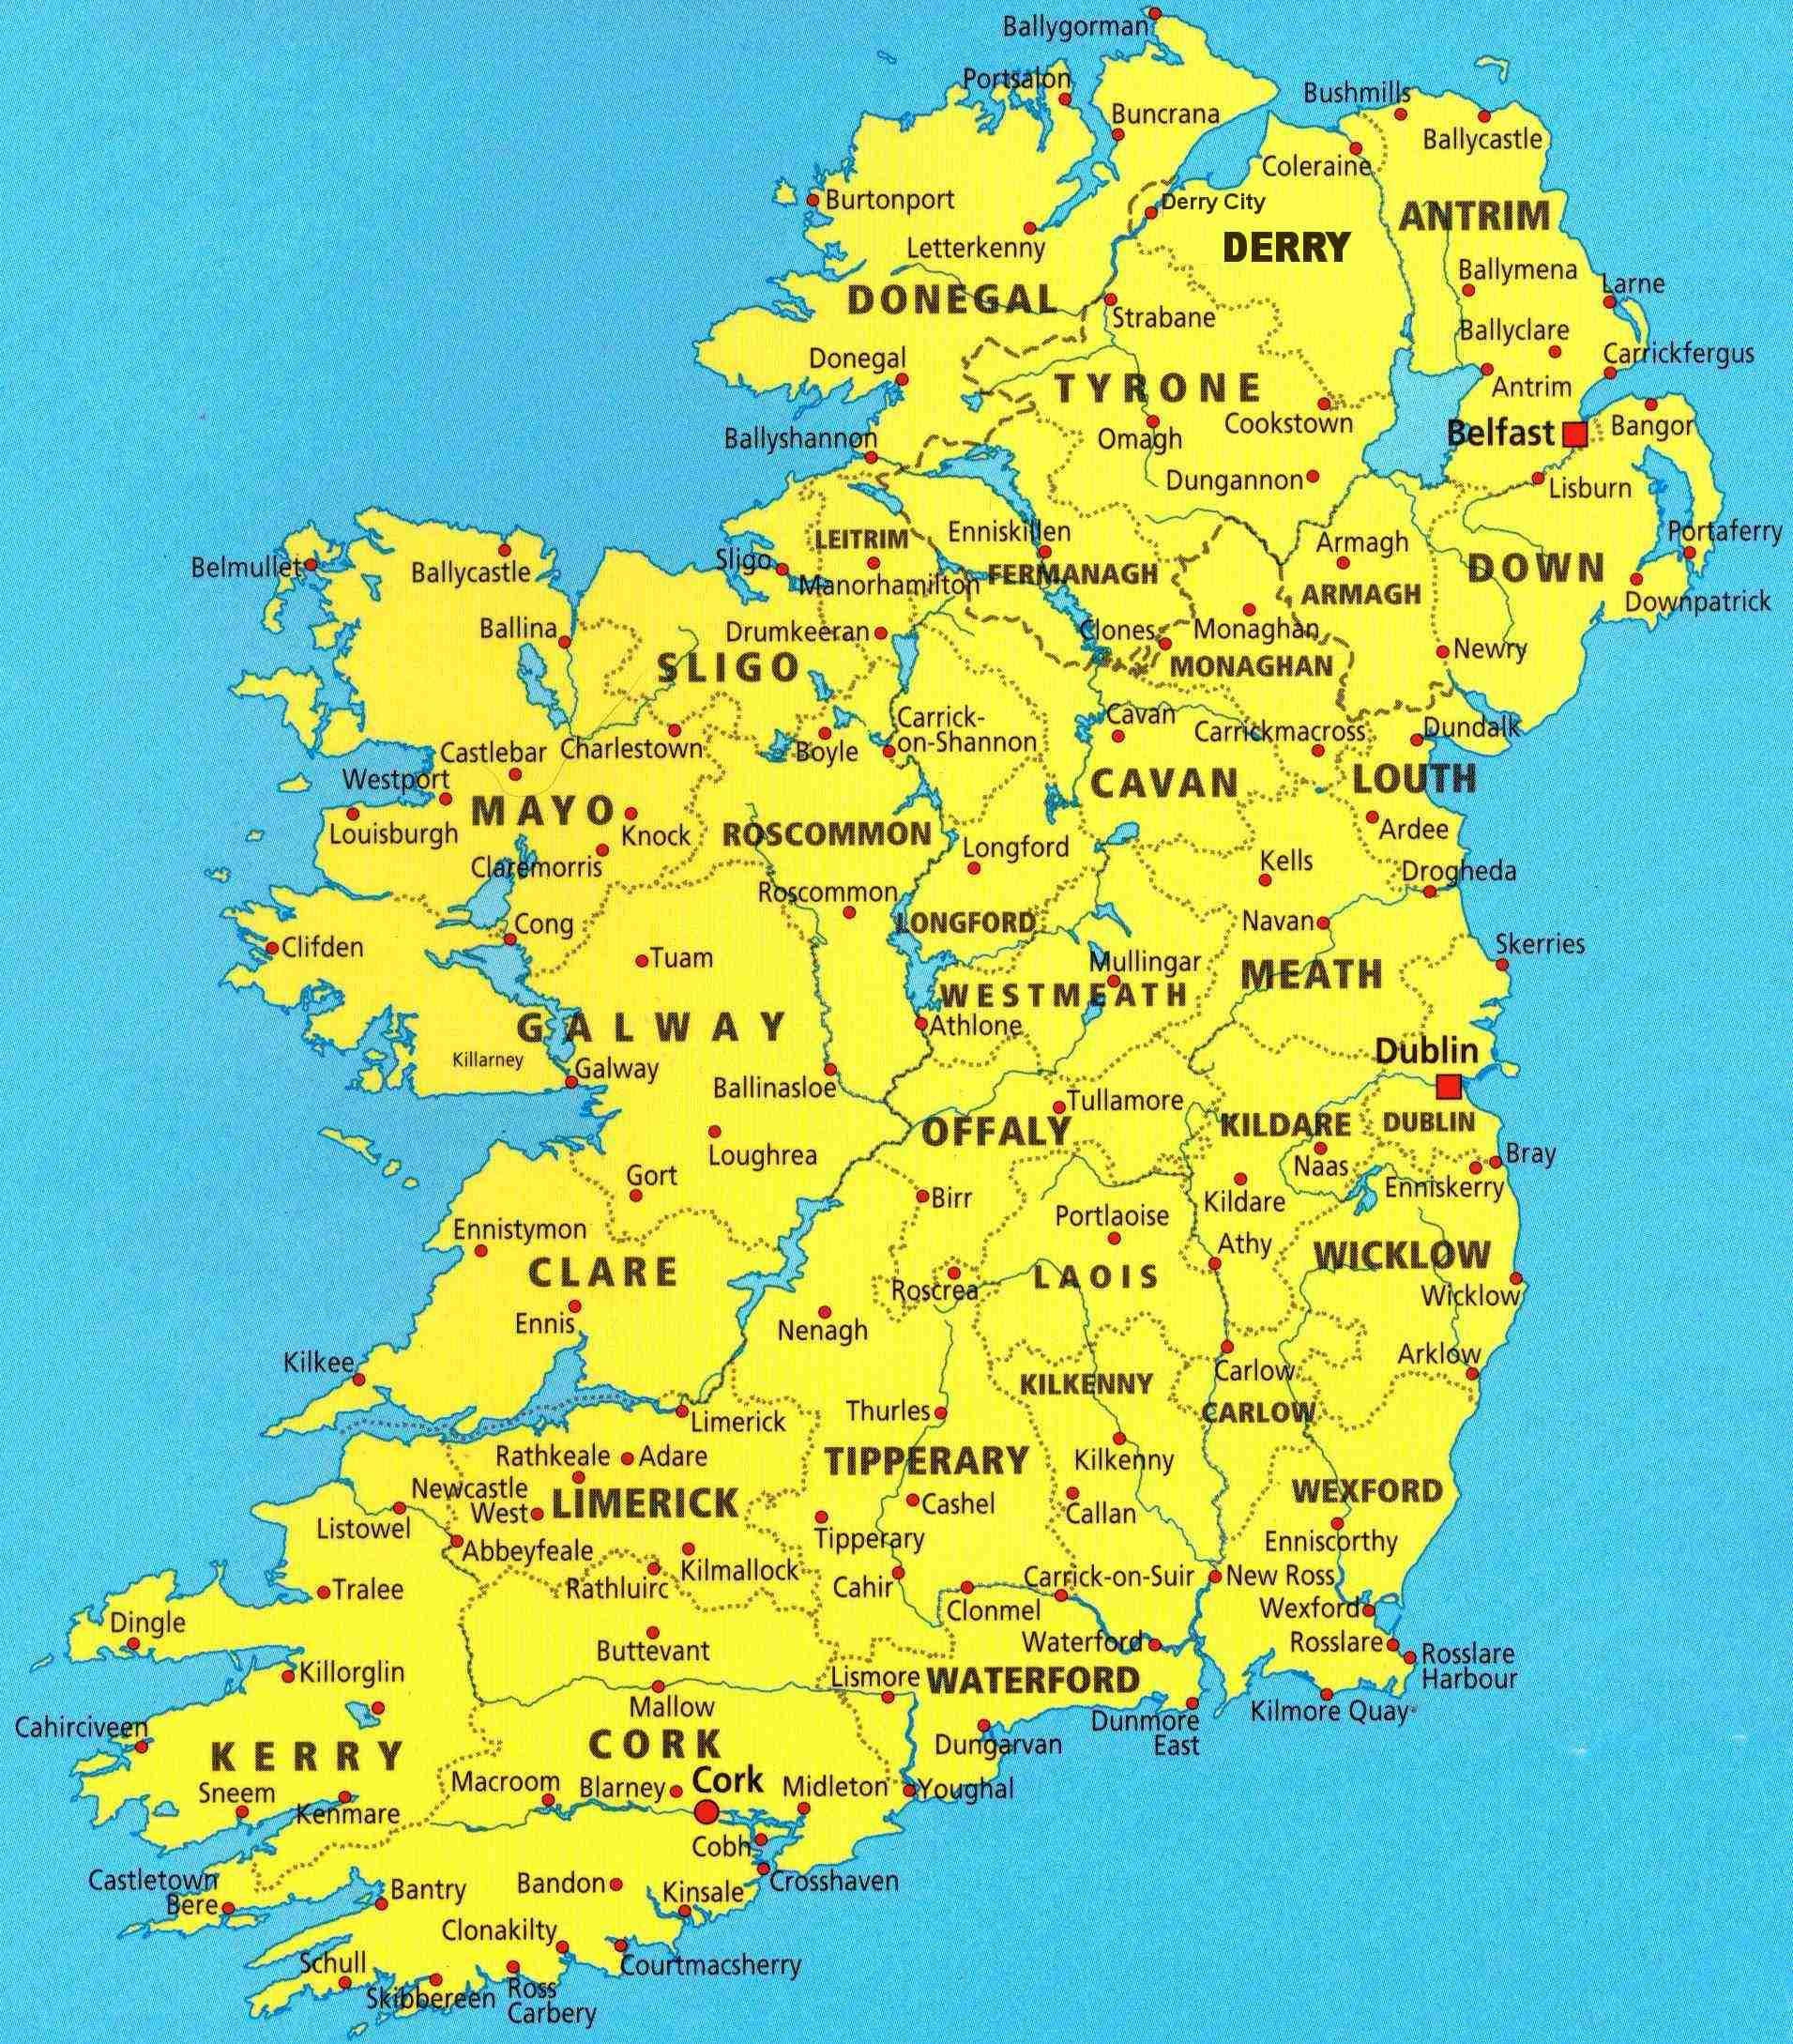 ireland map map of ireland width 1911 height 2178 filesize